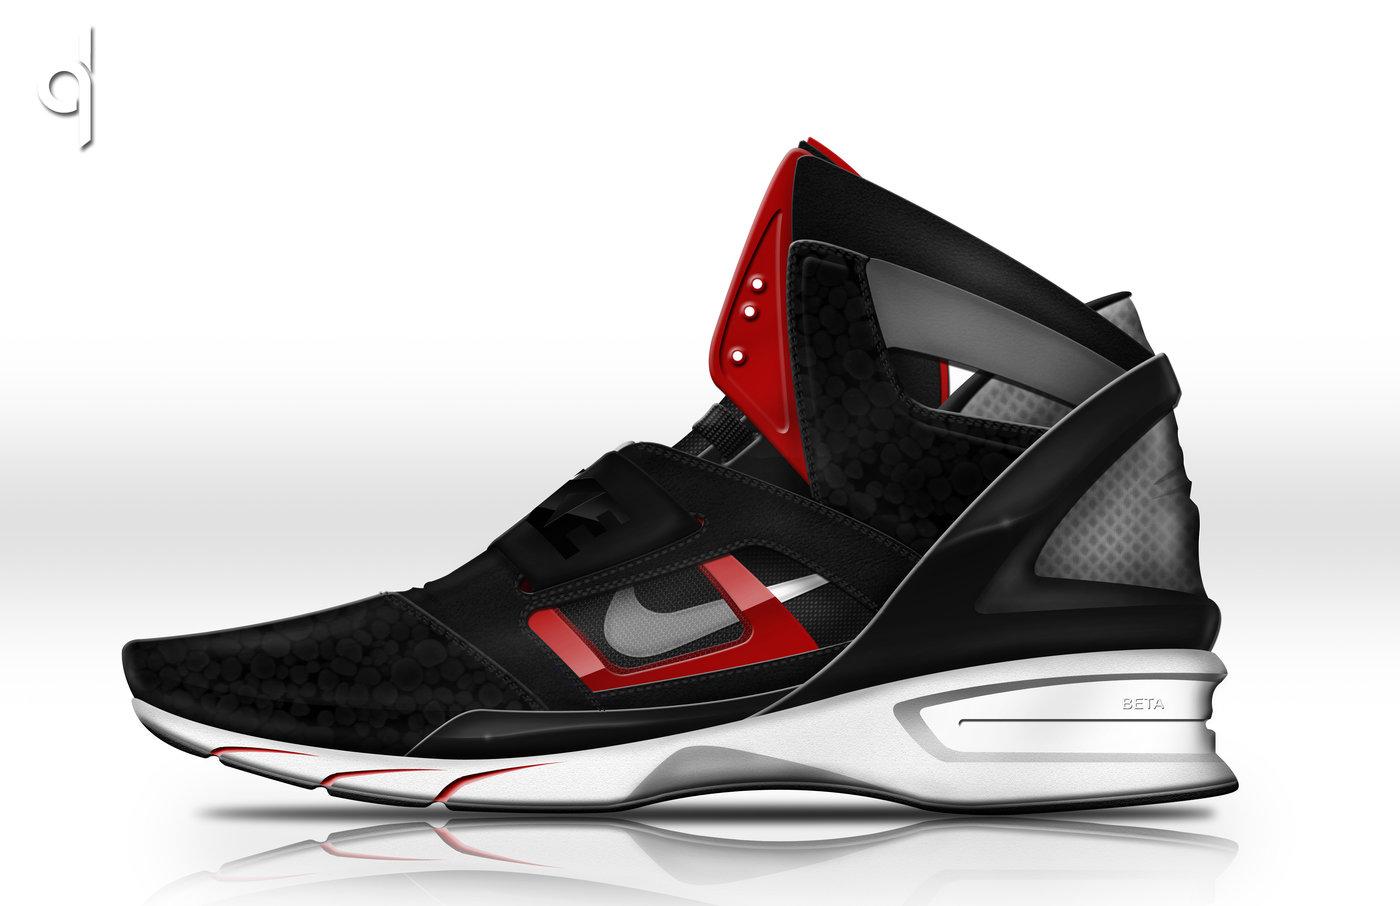 Nike Huarache Beta - I call it the Nike Huarache Beta. Beta because of the  Beta heel. The heel is made of Beta Gel which is a high-shock absorbing  material.